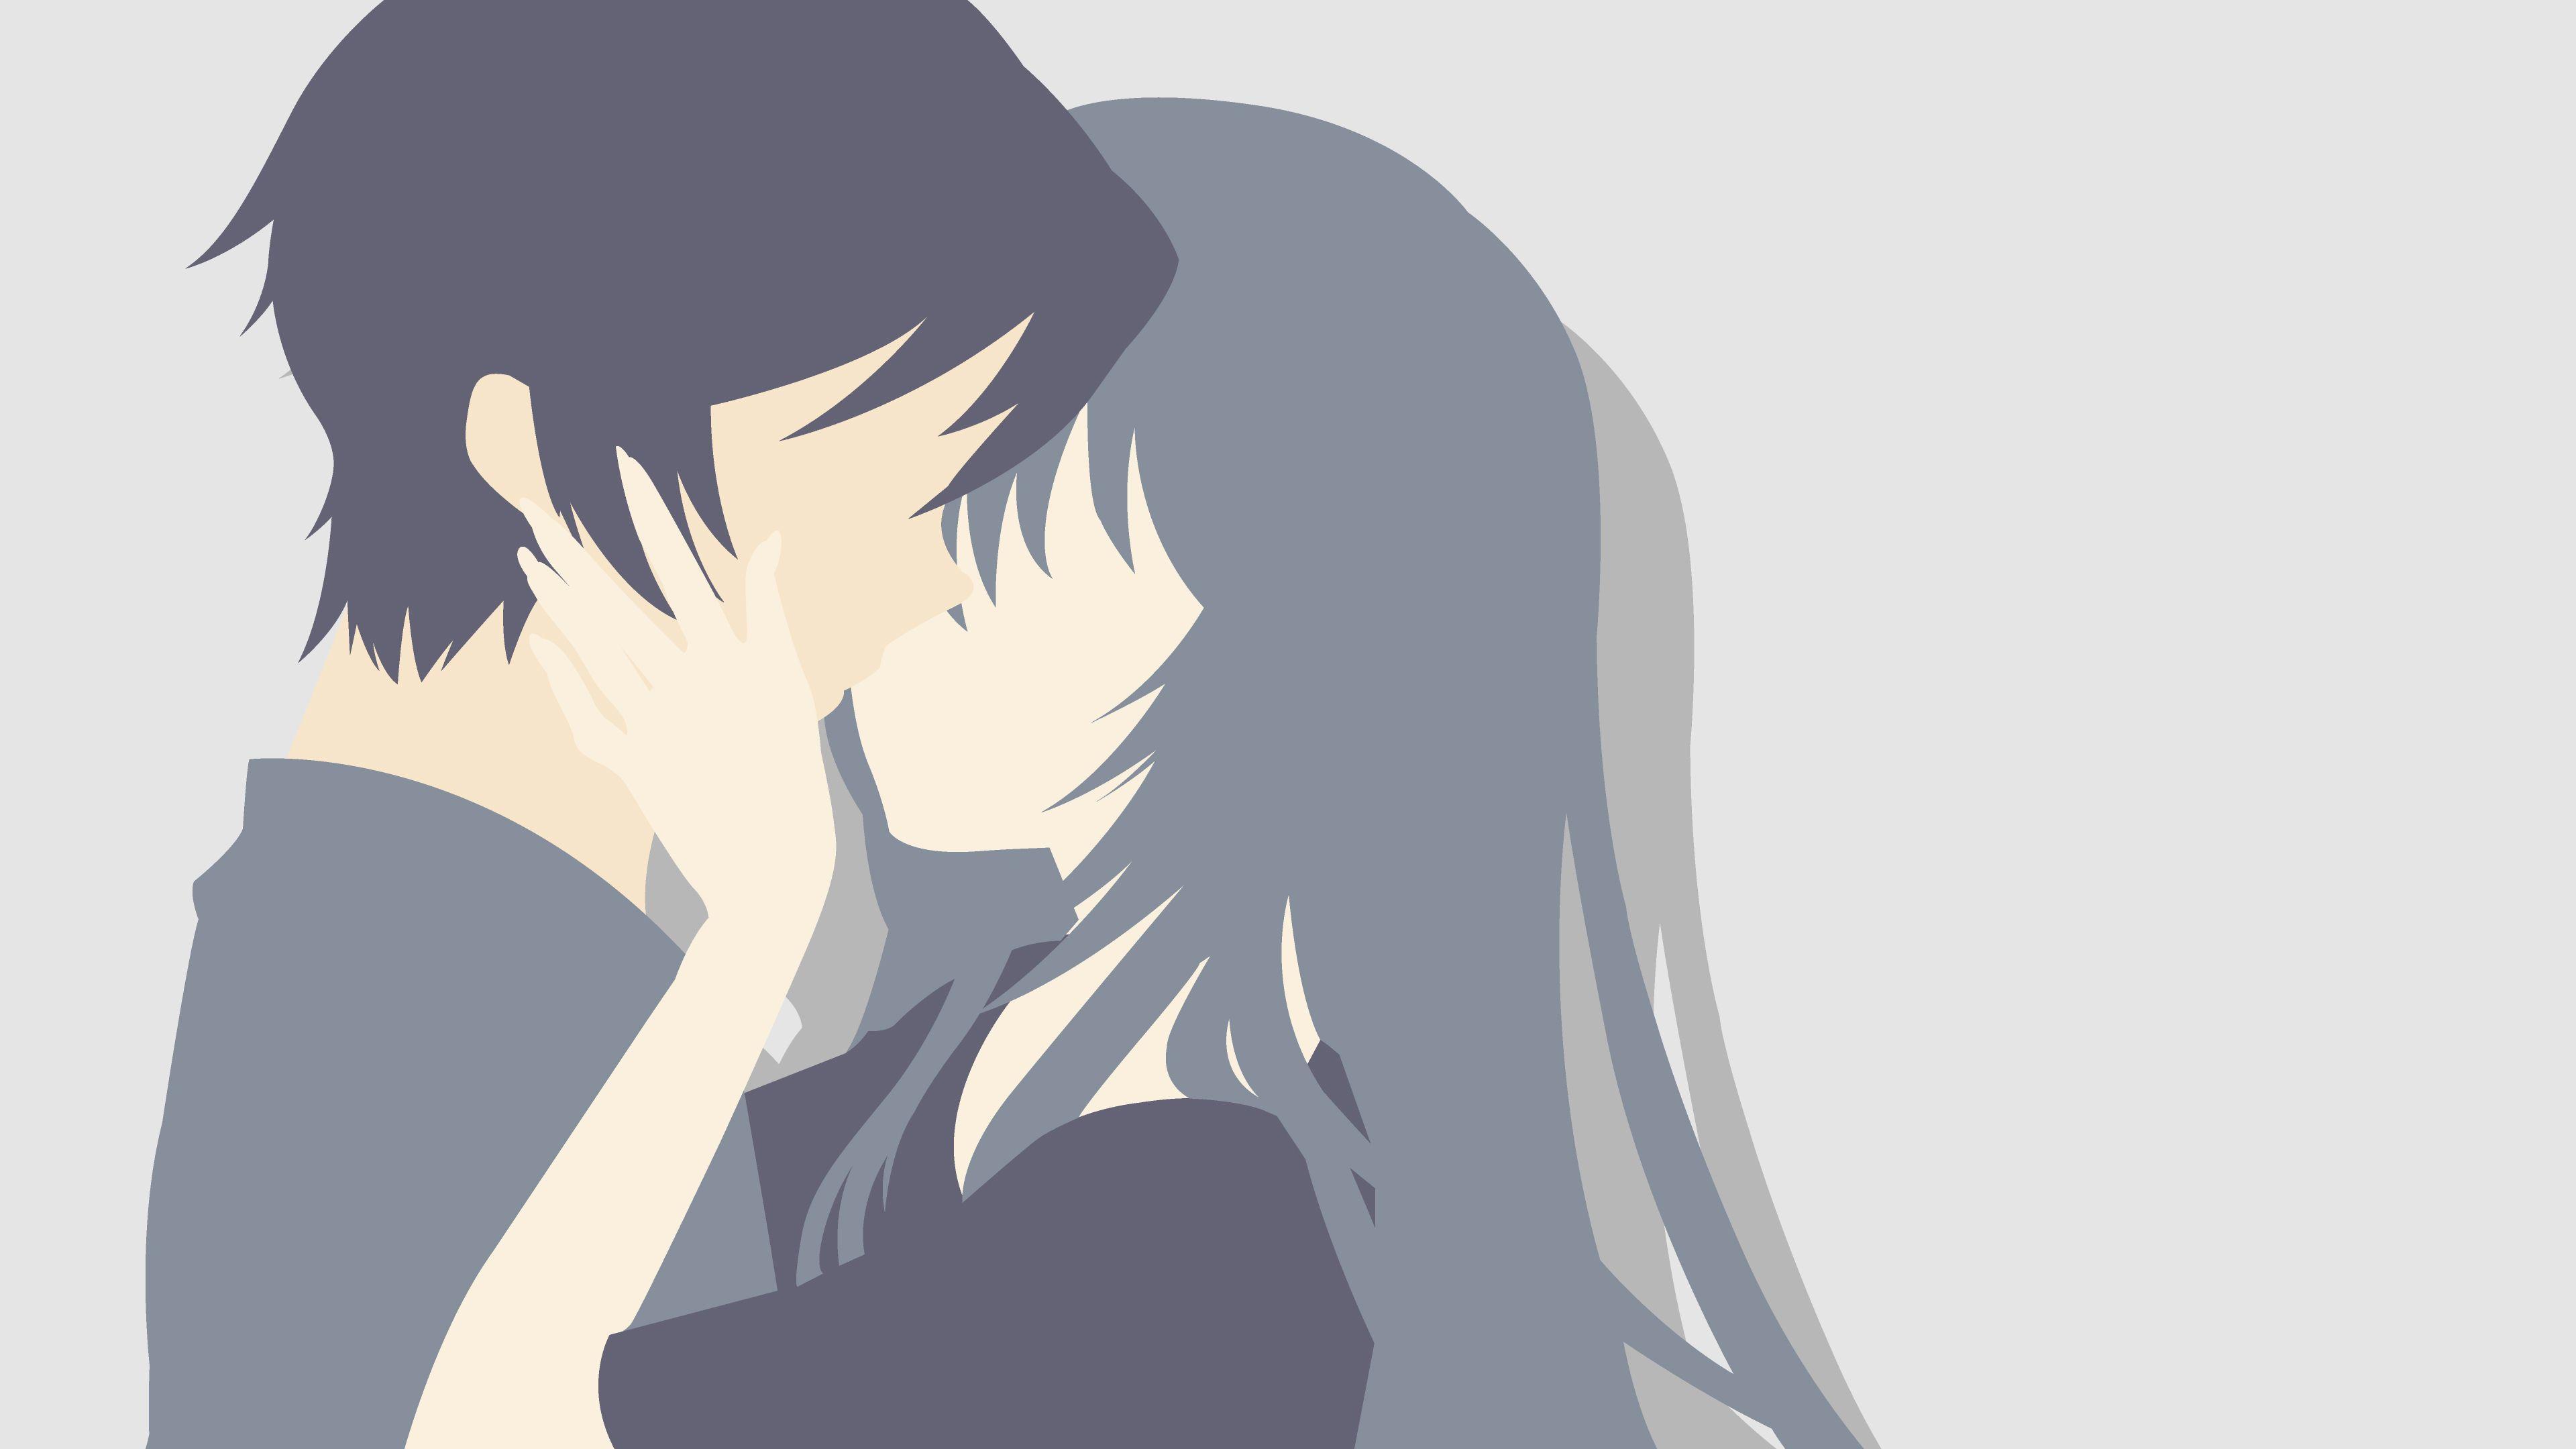 Anime Couple Minimalist Wallpaper By Microchokushex The Ancient Magus Bride Anime Anime Minimalist